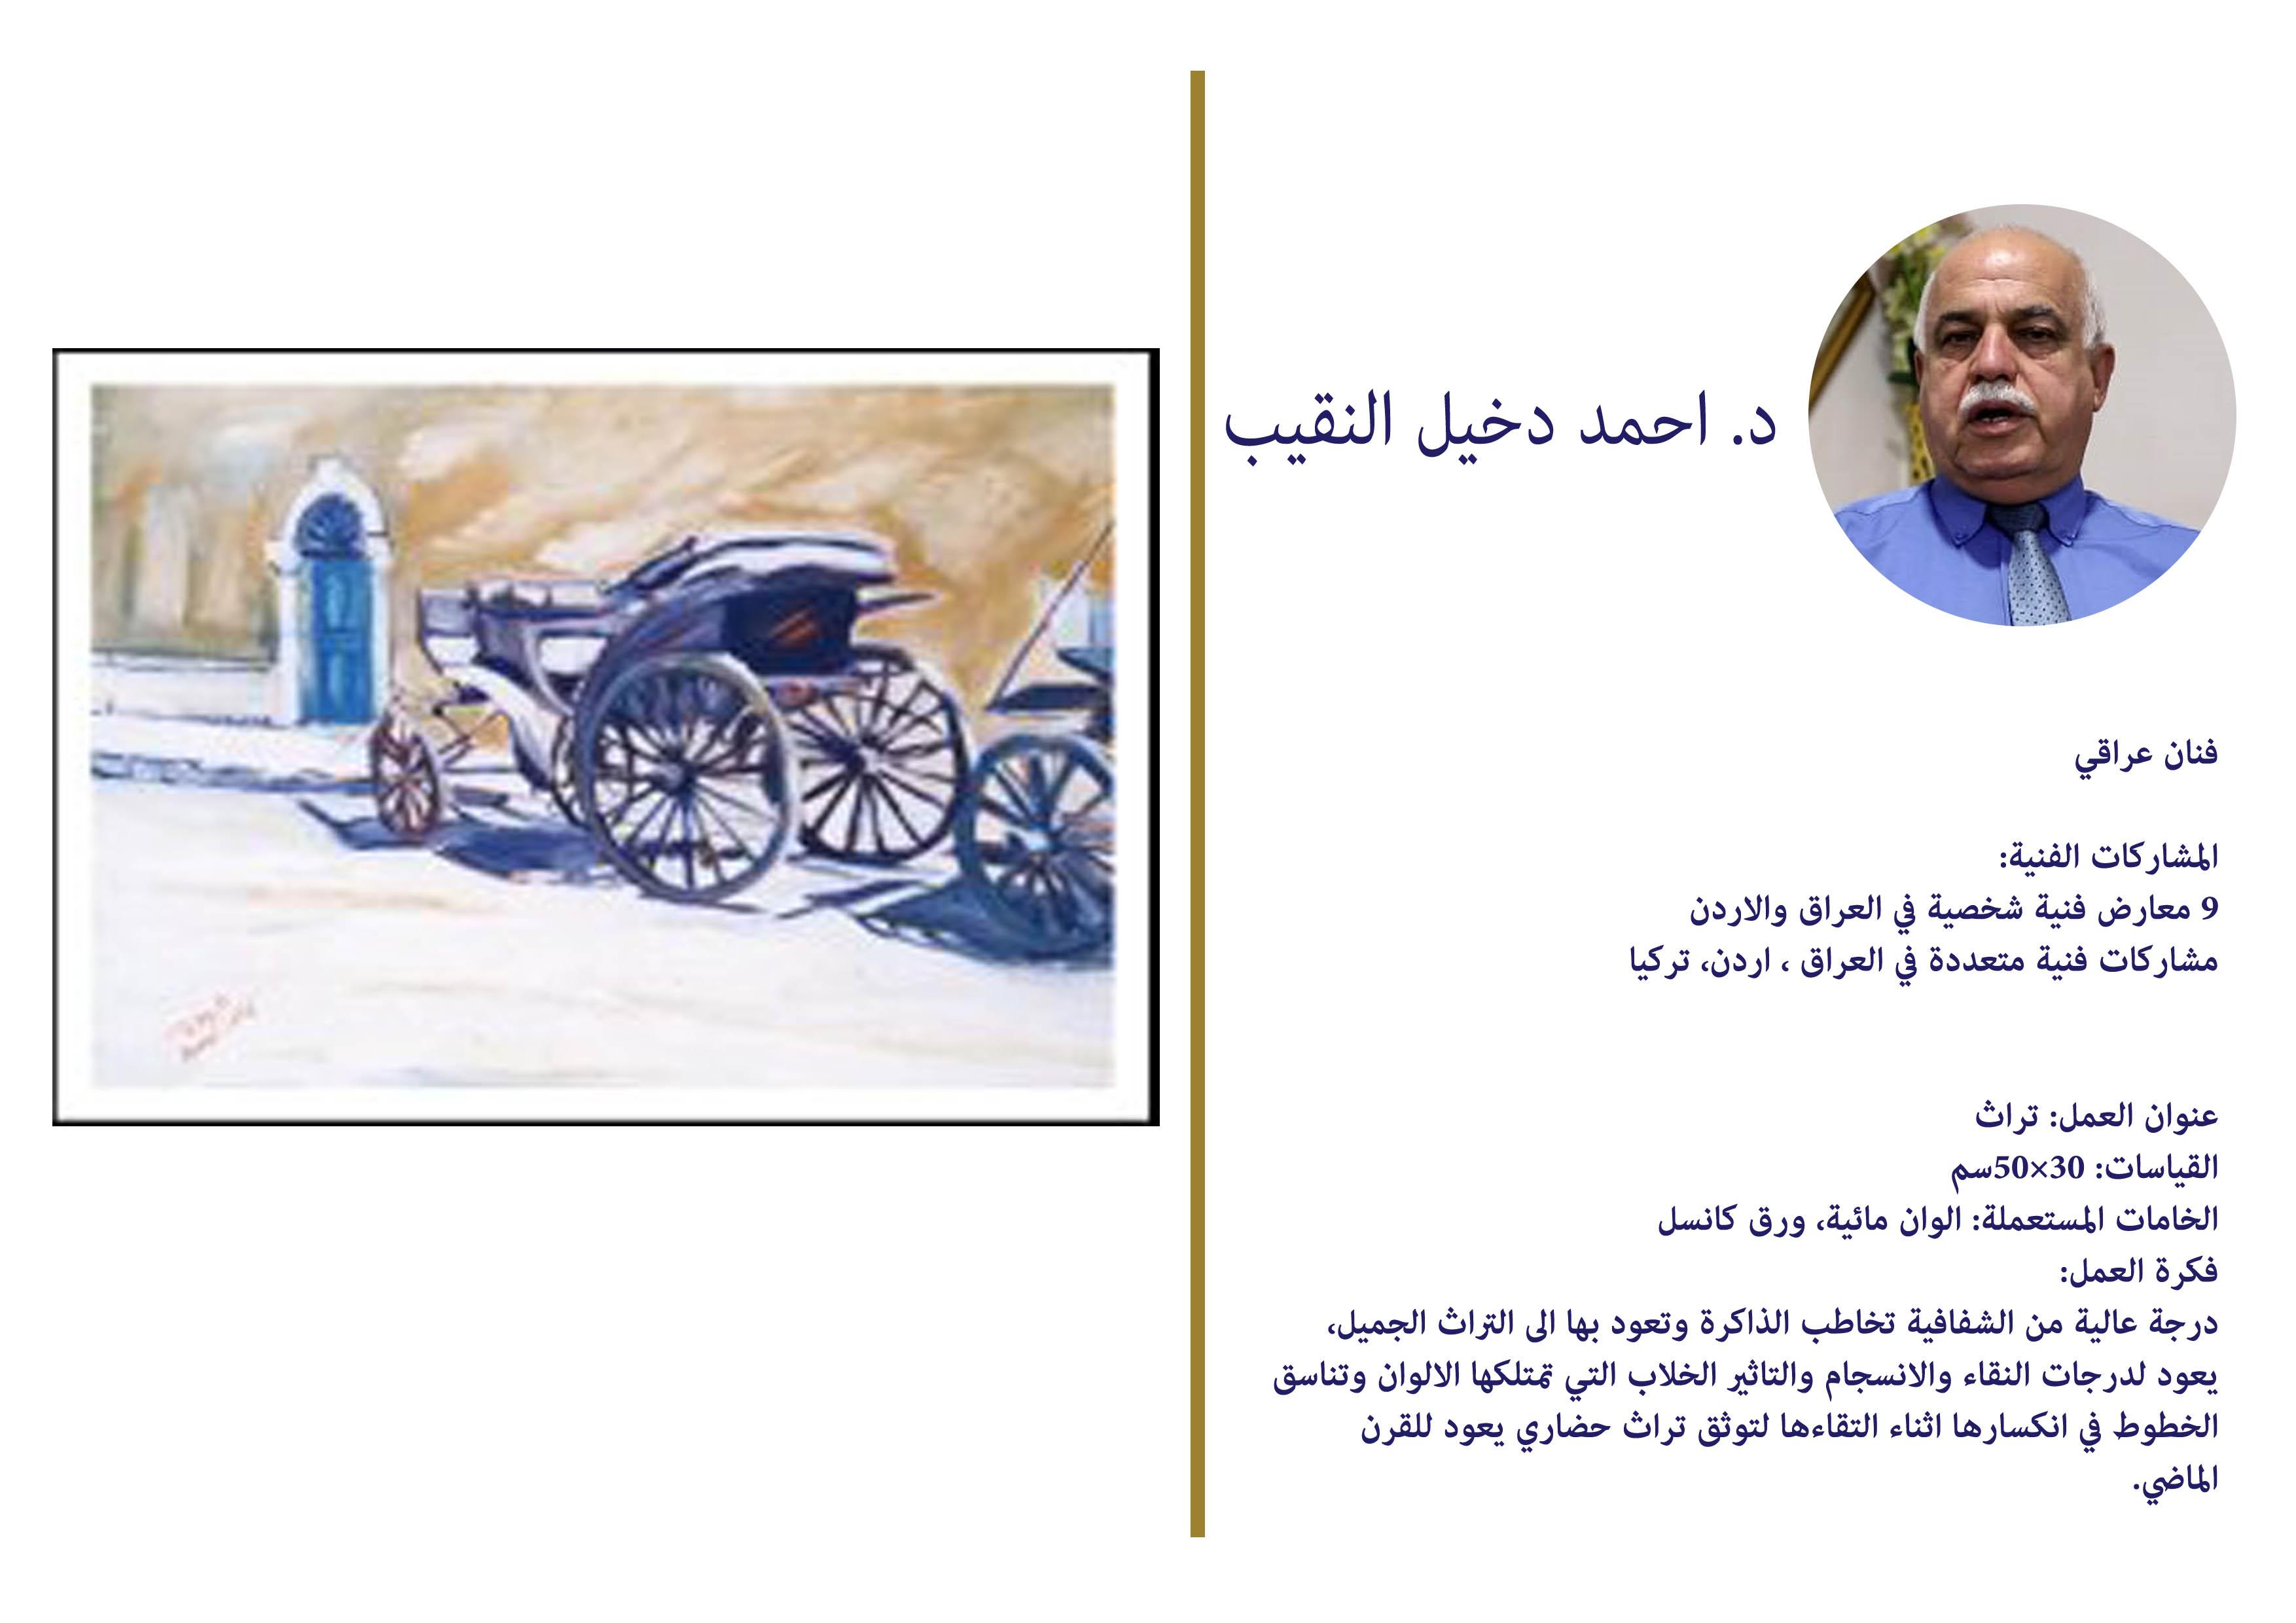 د. احمد دخيل النقيب